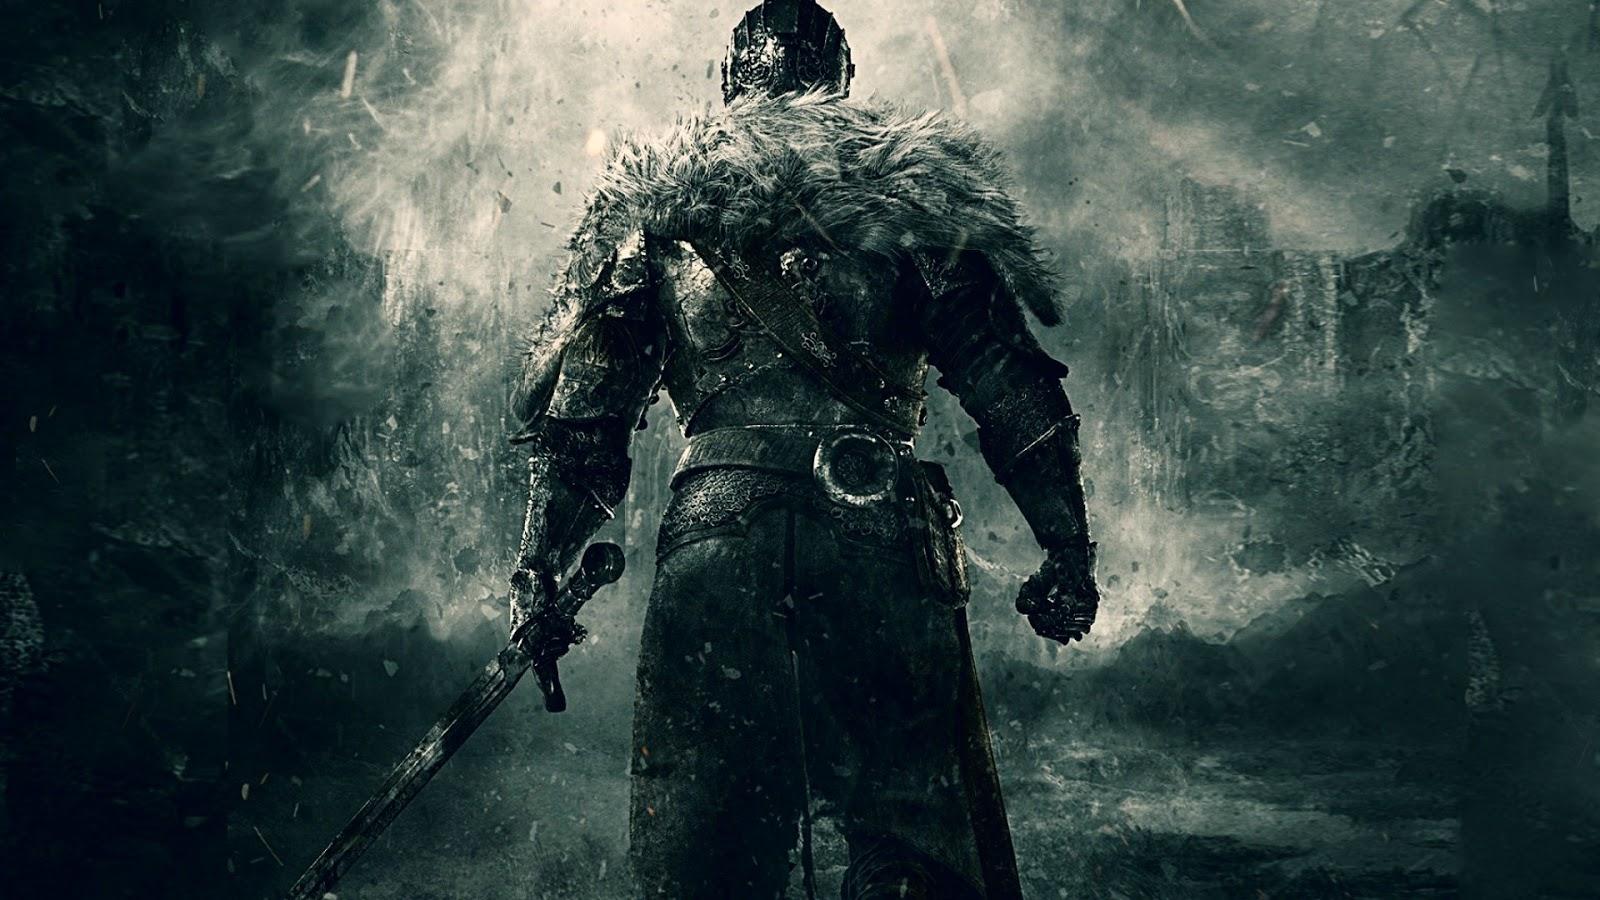 Dark Souls Wallpaper